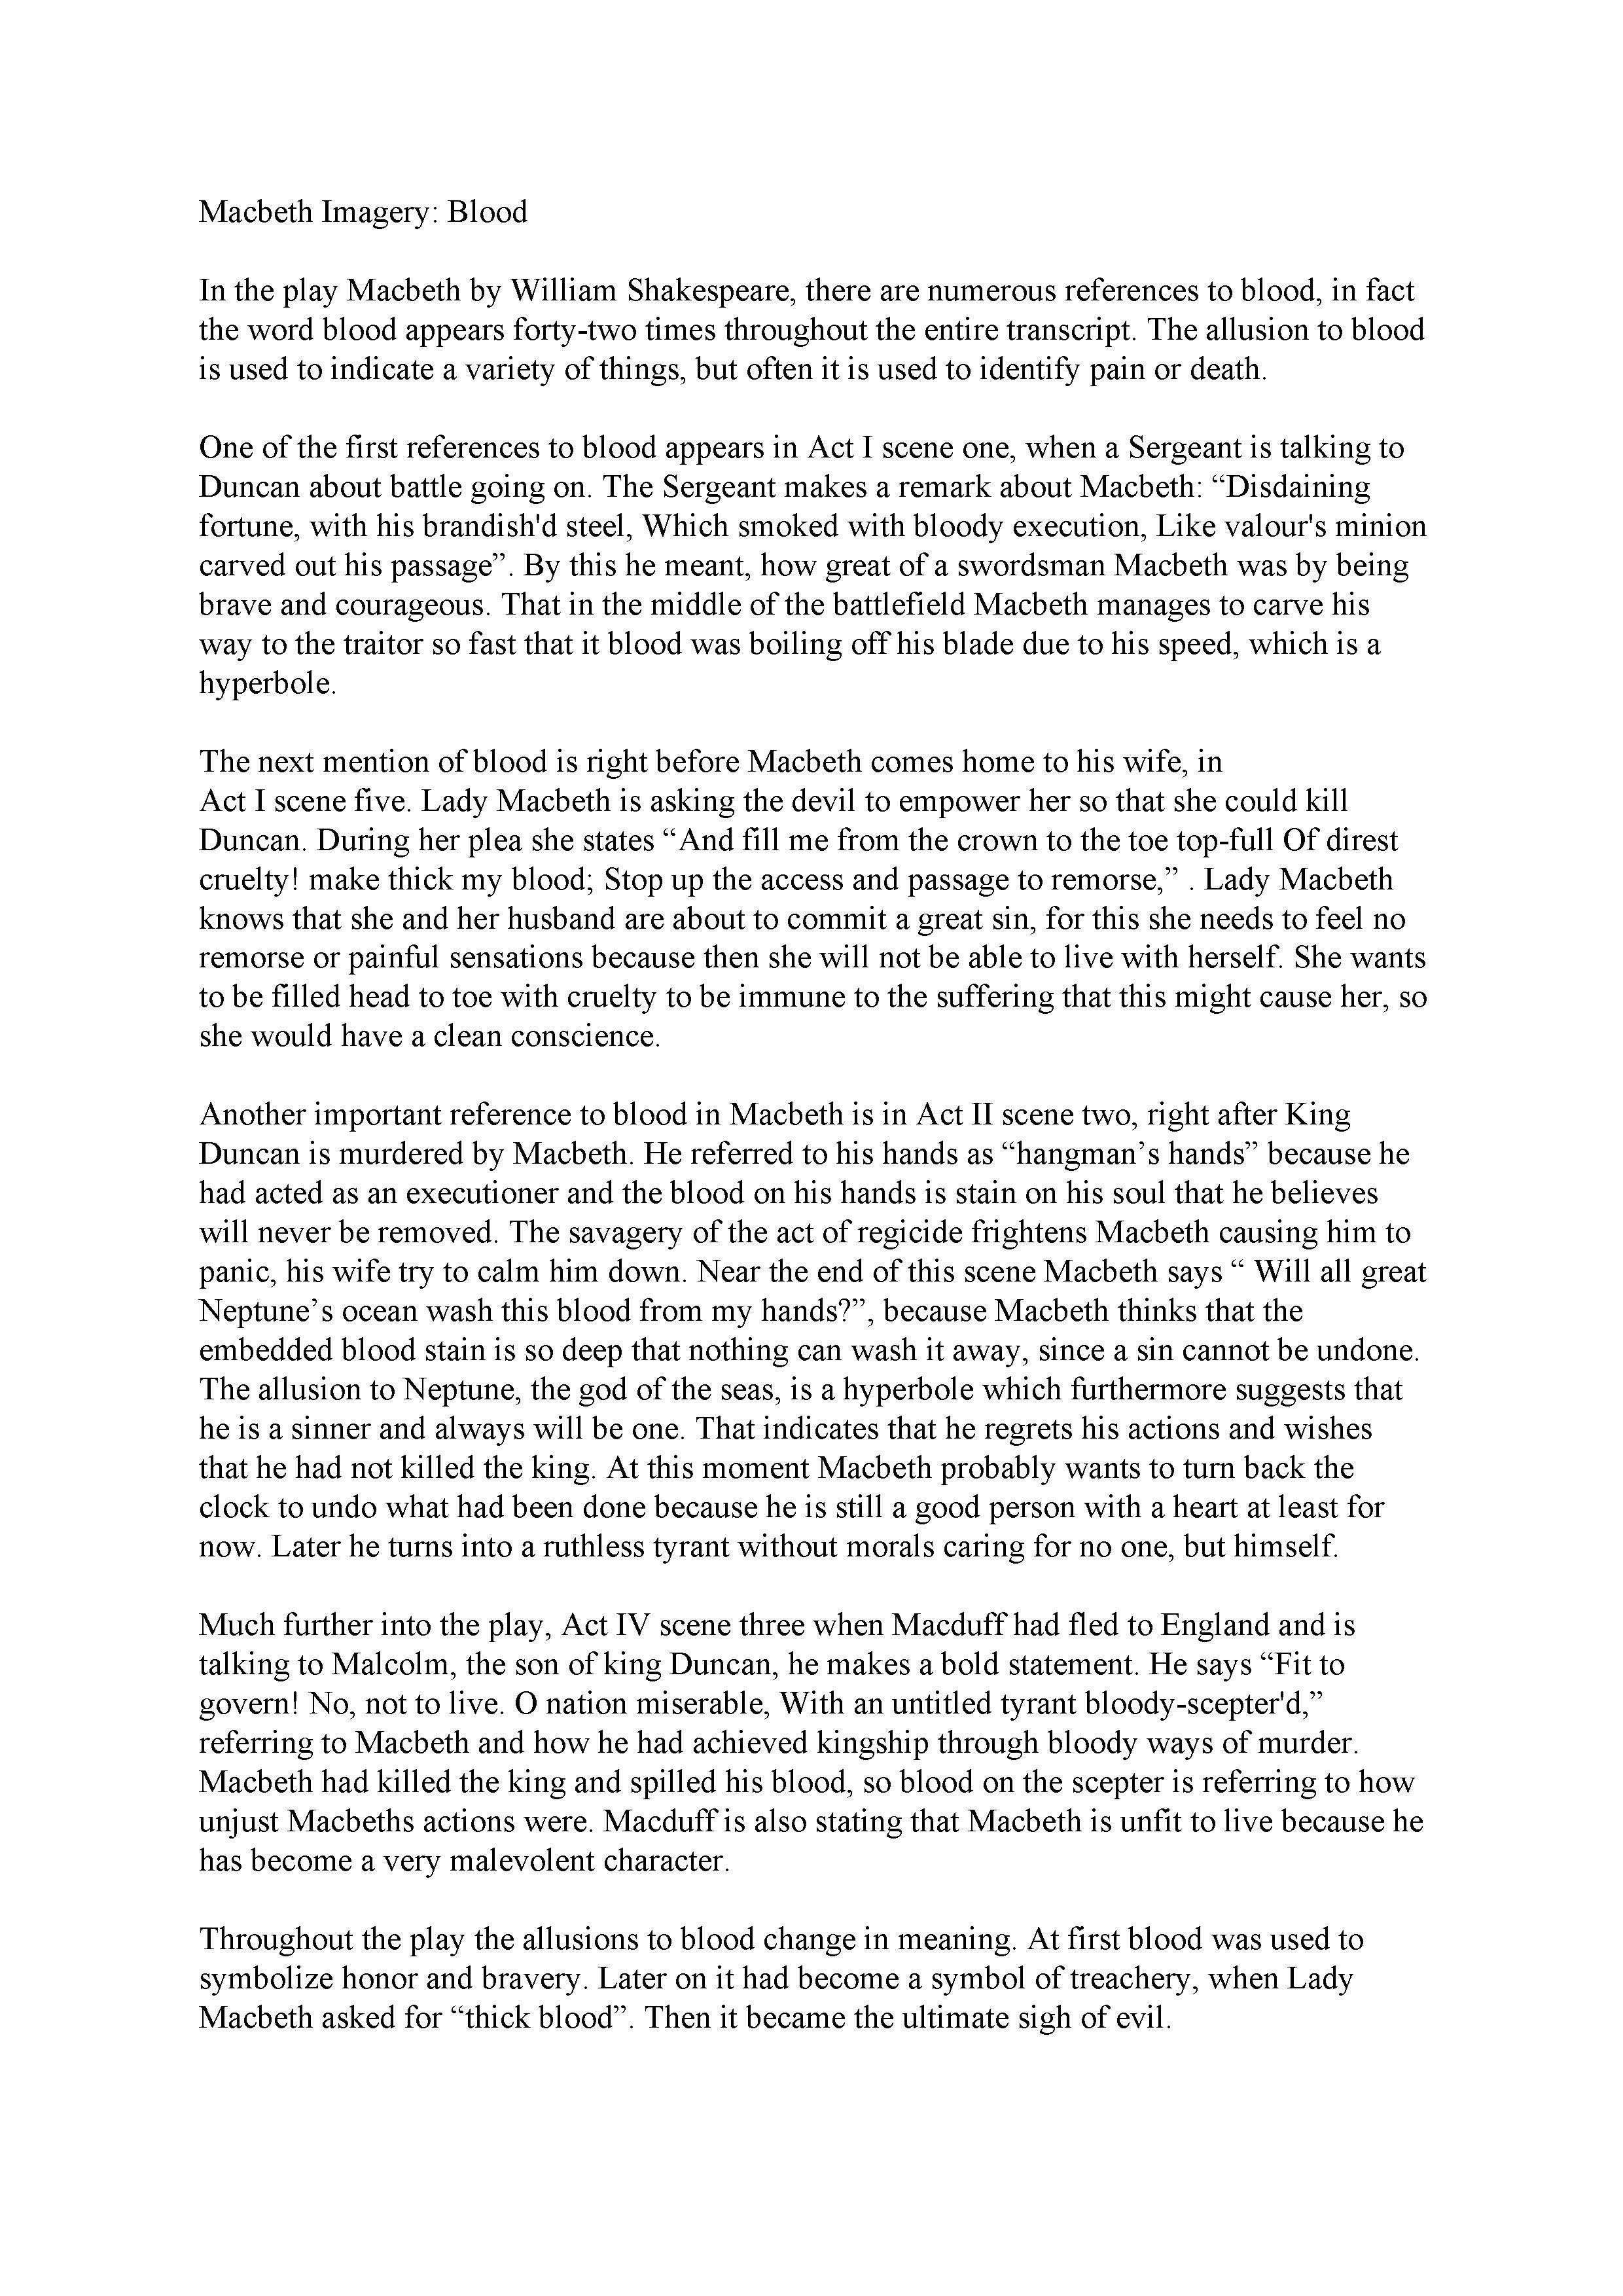 004 Macbeth Essay Sample Essayss Striking Essays Examples Tagalog Argumentative Pdf Samples Full